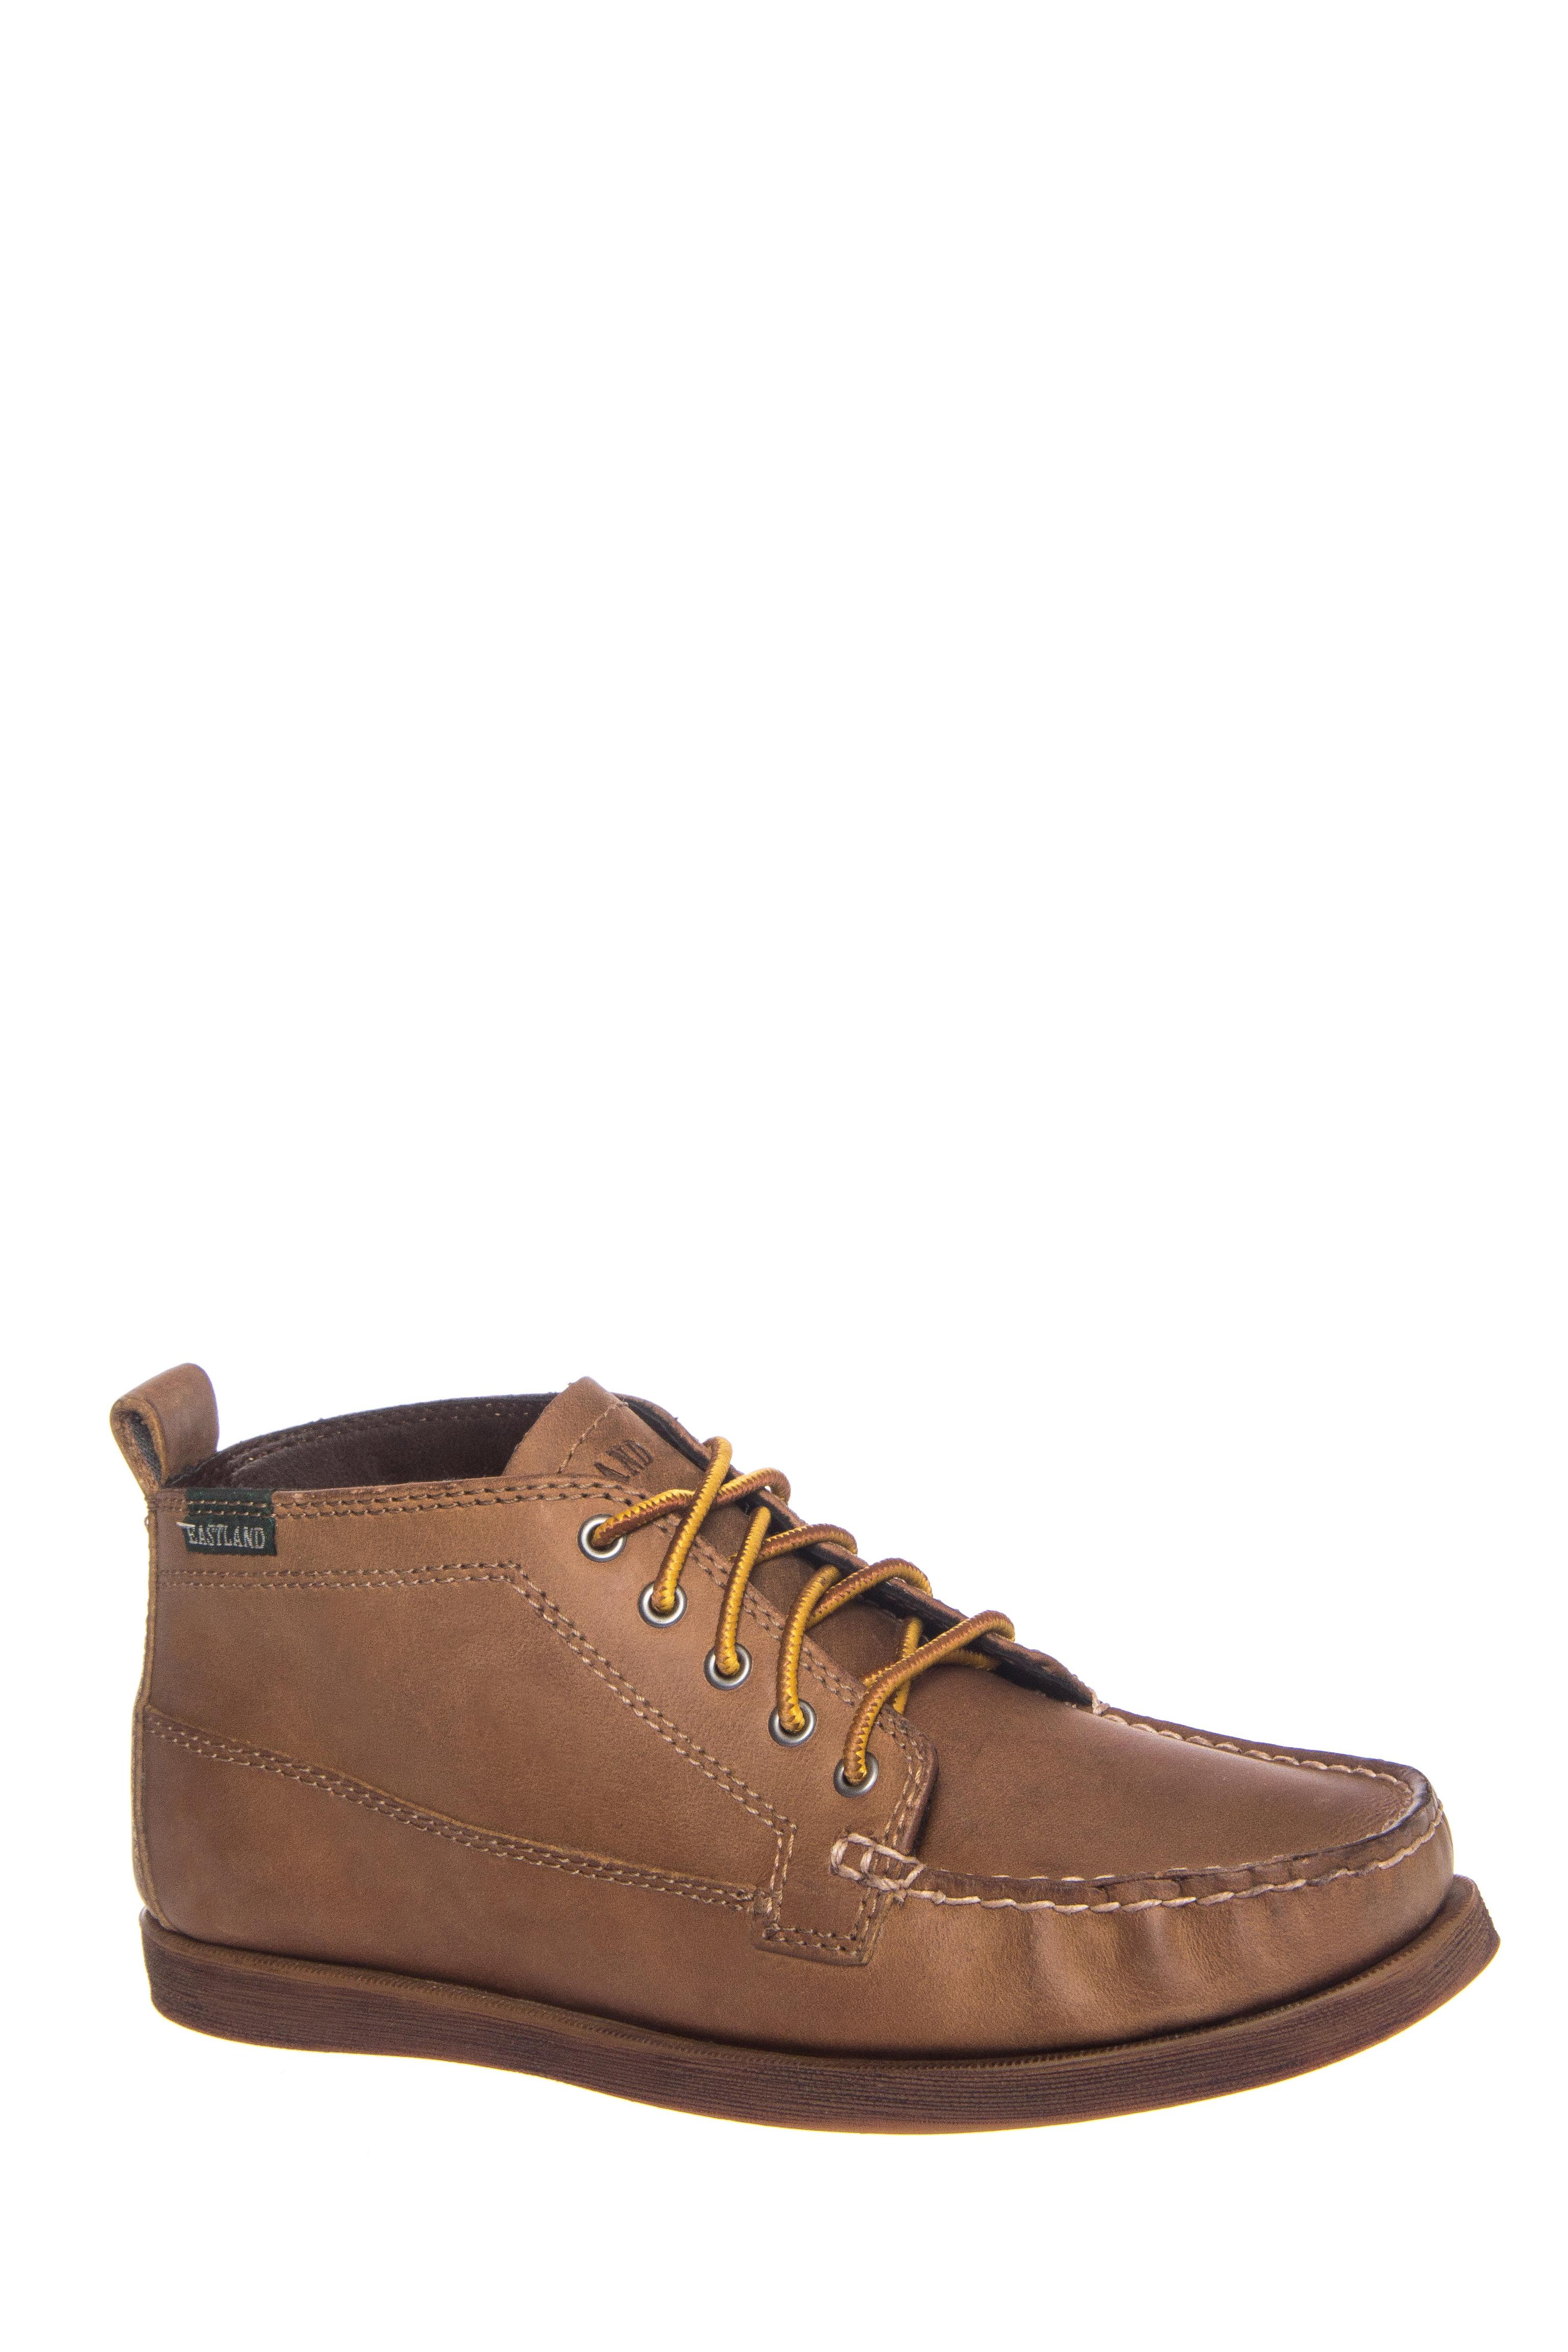 Seneca Moccasins Chukka Boot